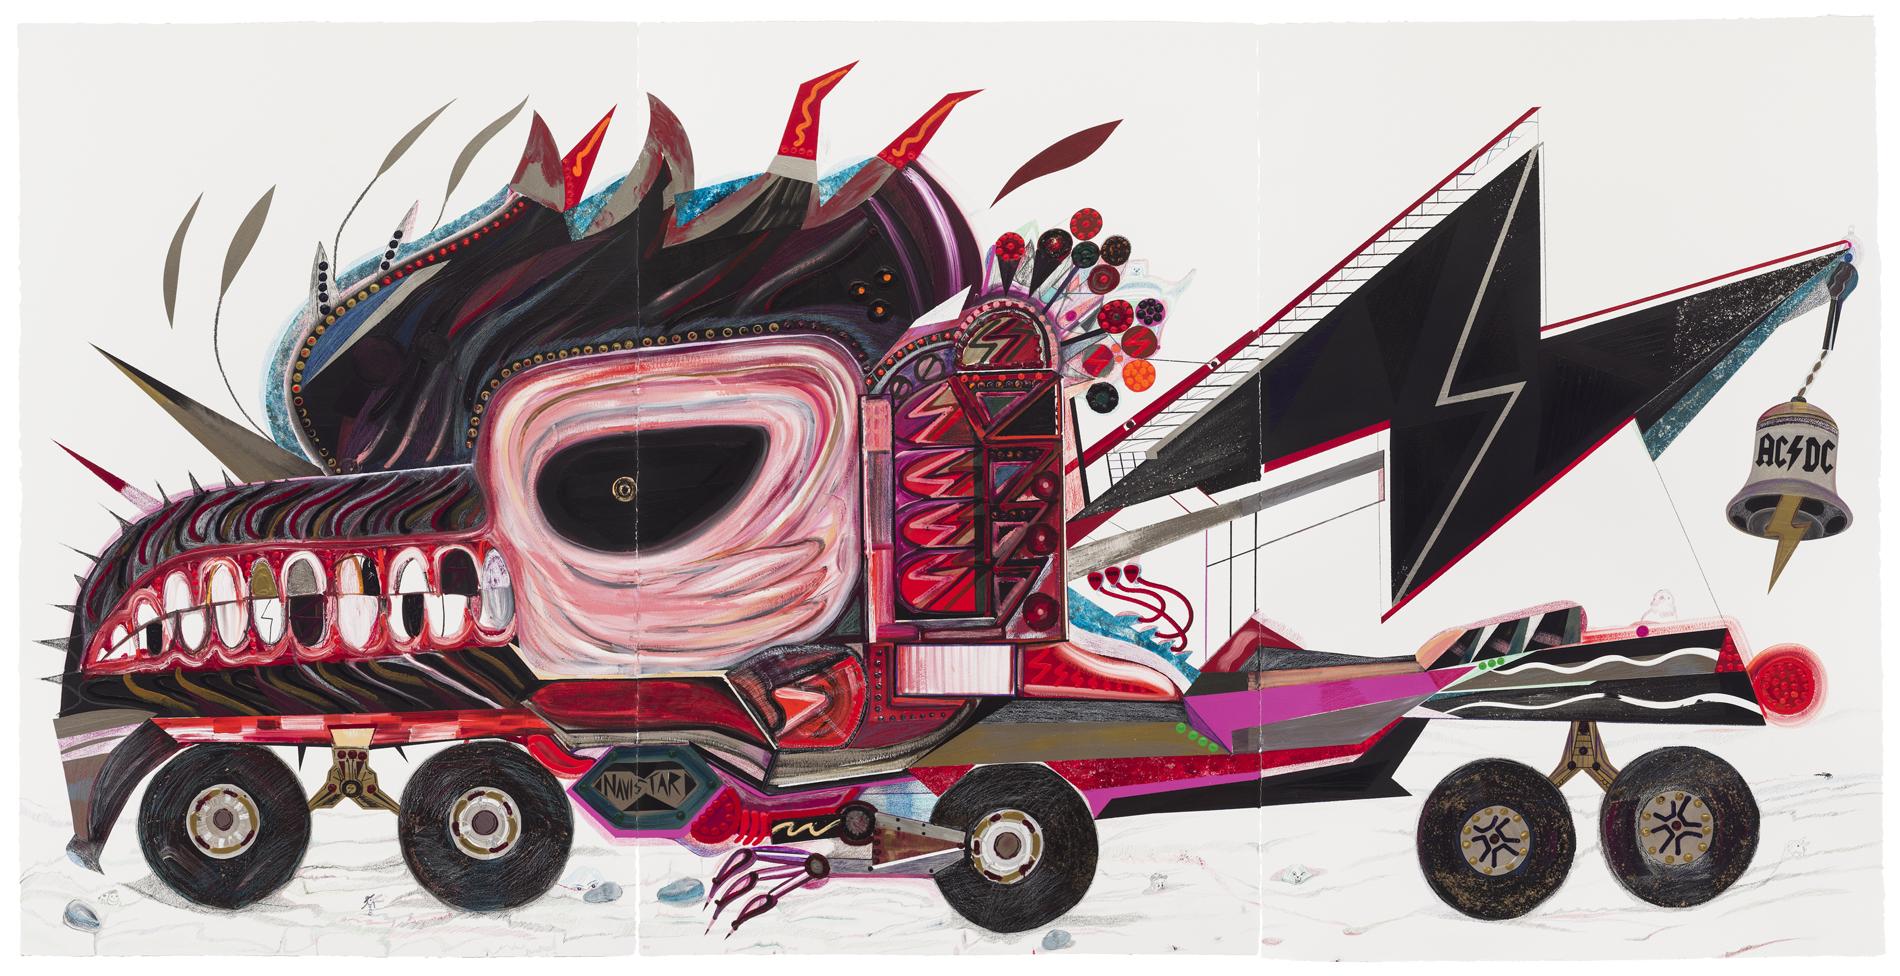 Abdul Vas. American Truck. Sir Angola 83 Hell`s Bell Zedu Eduardo Dos Santos, Angola, IN-Navistar, 2014